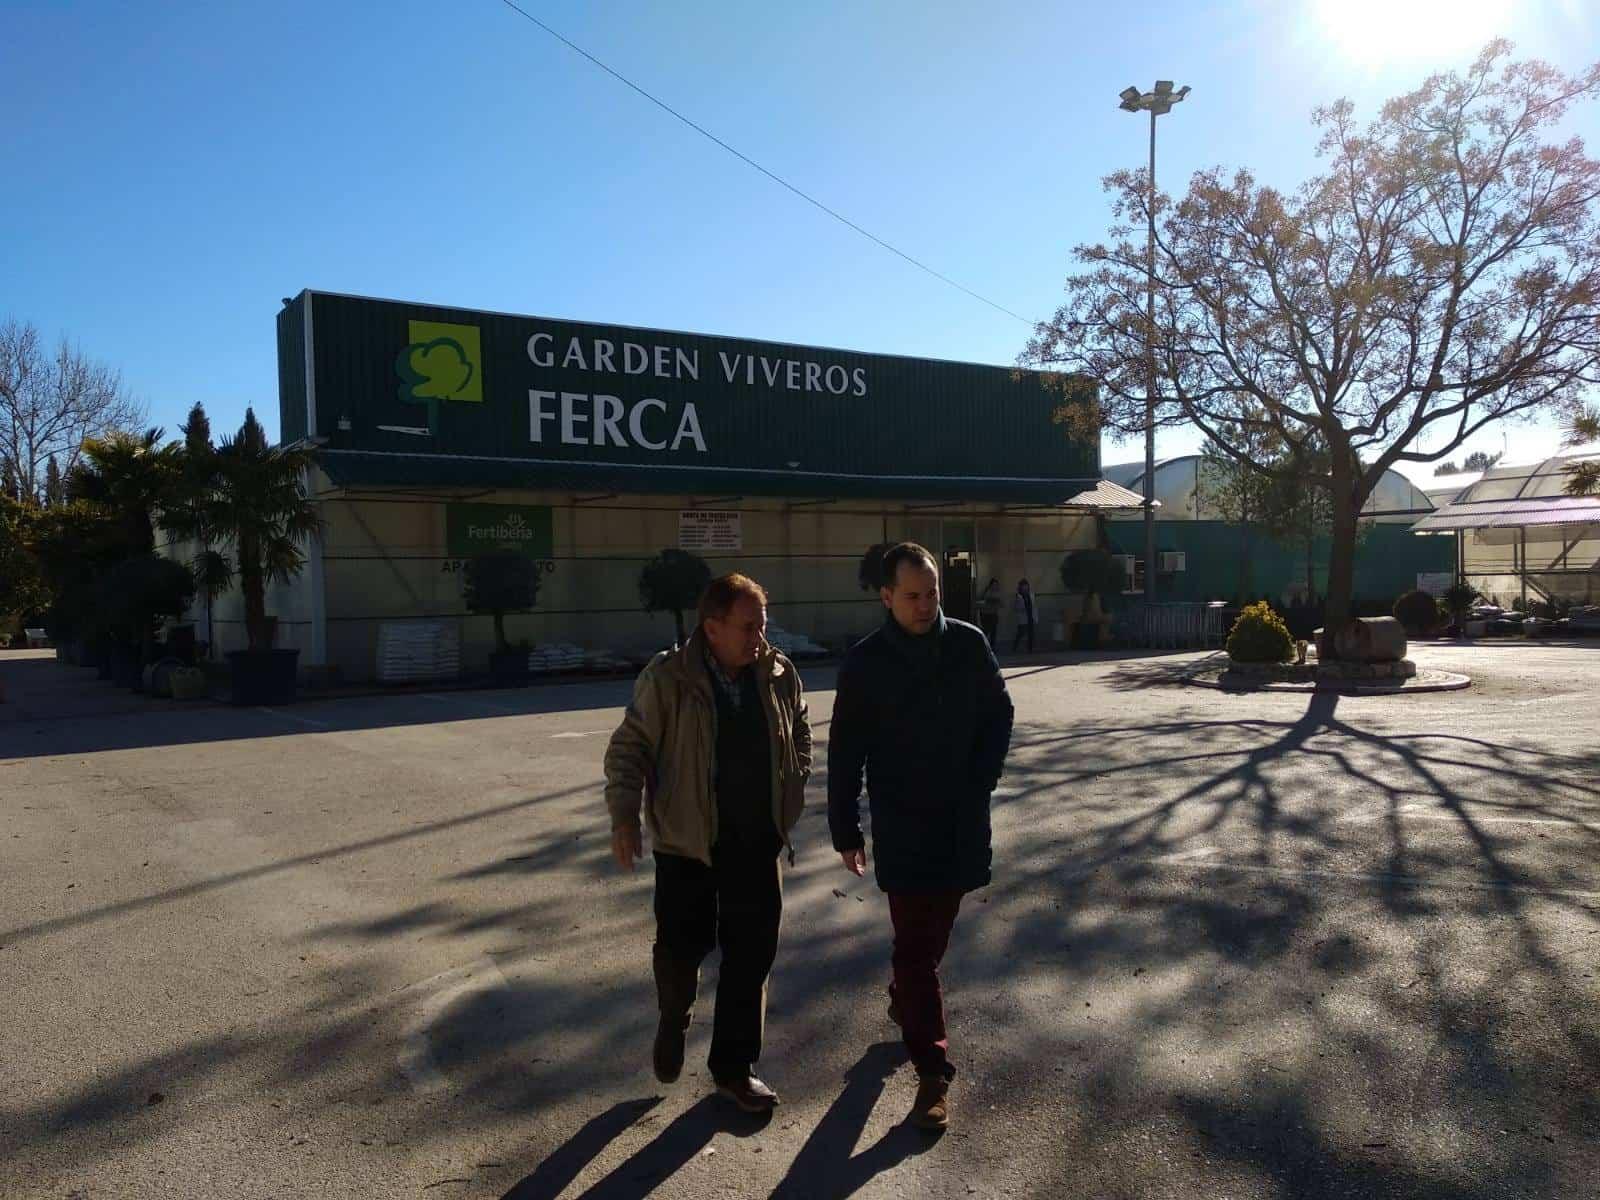 viveros ferca visita alcalde herencia 2 - Viveros Ferca recibe la visita del Alcalde de Herencia